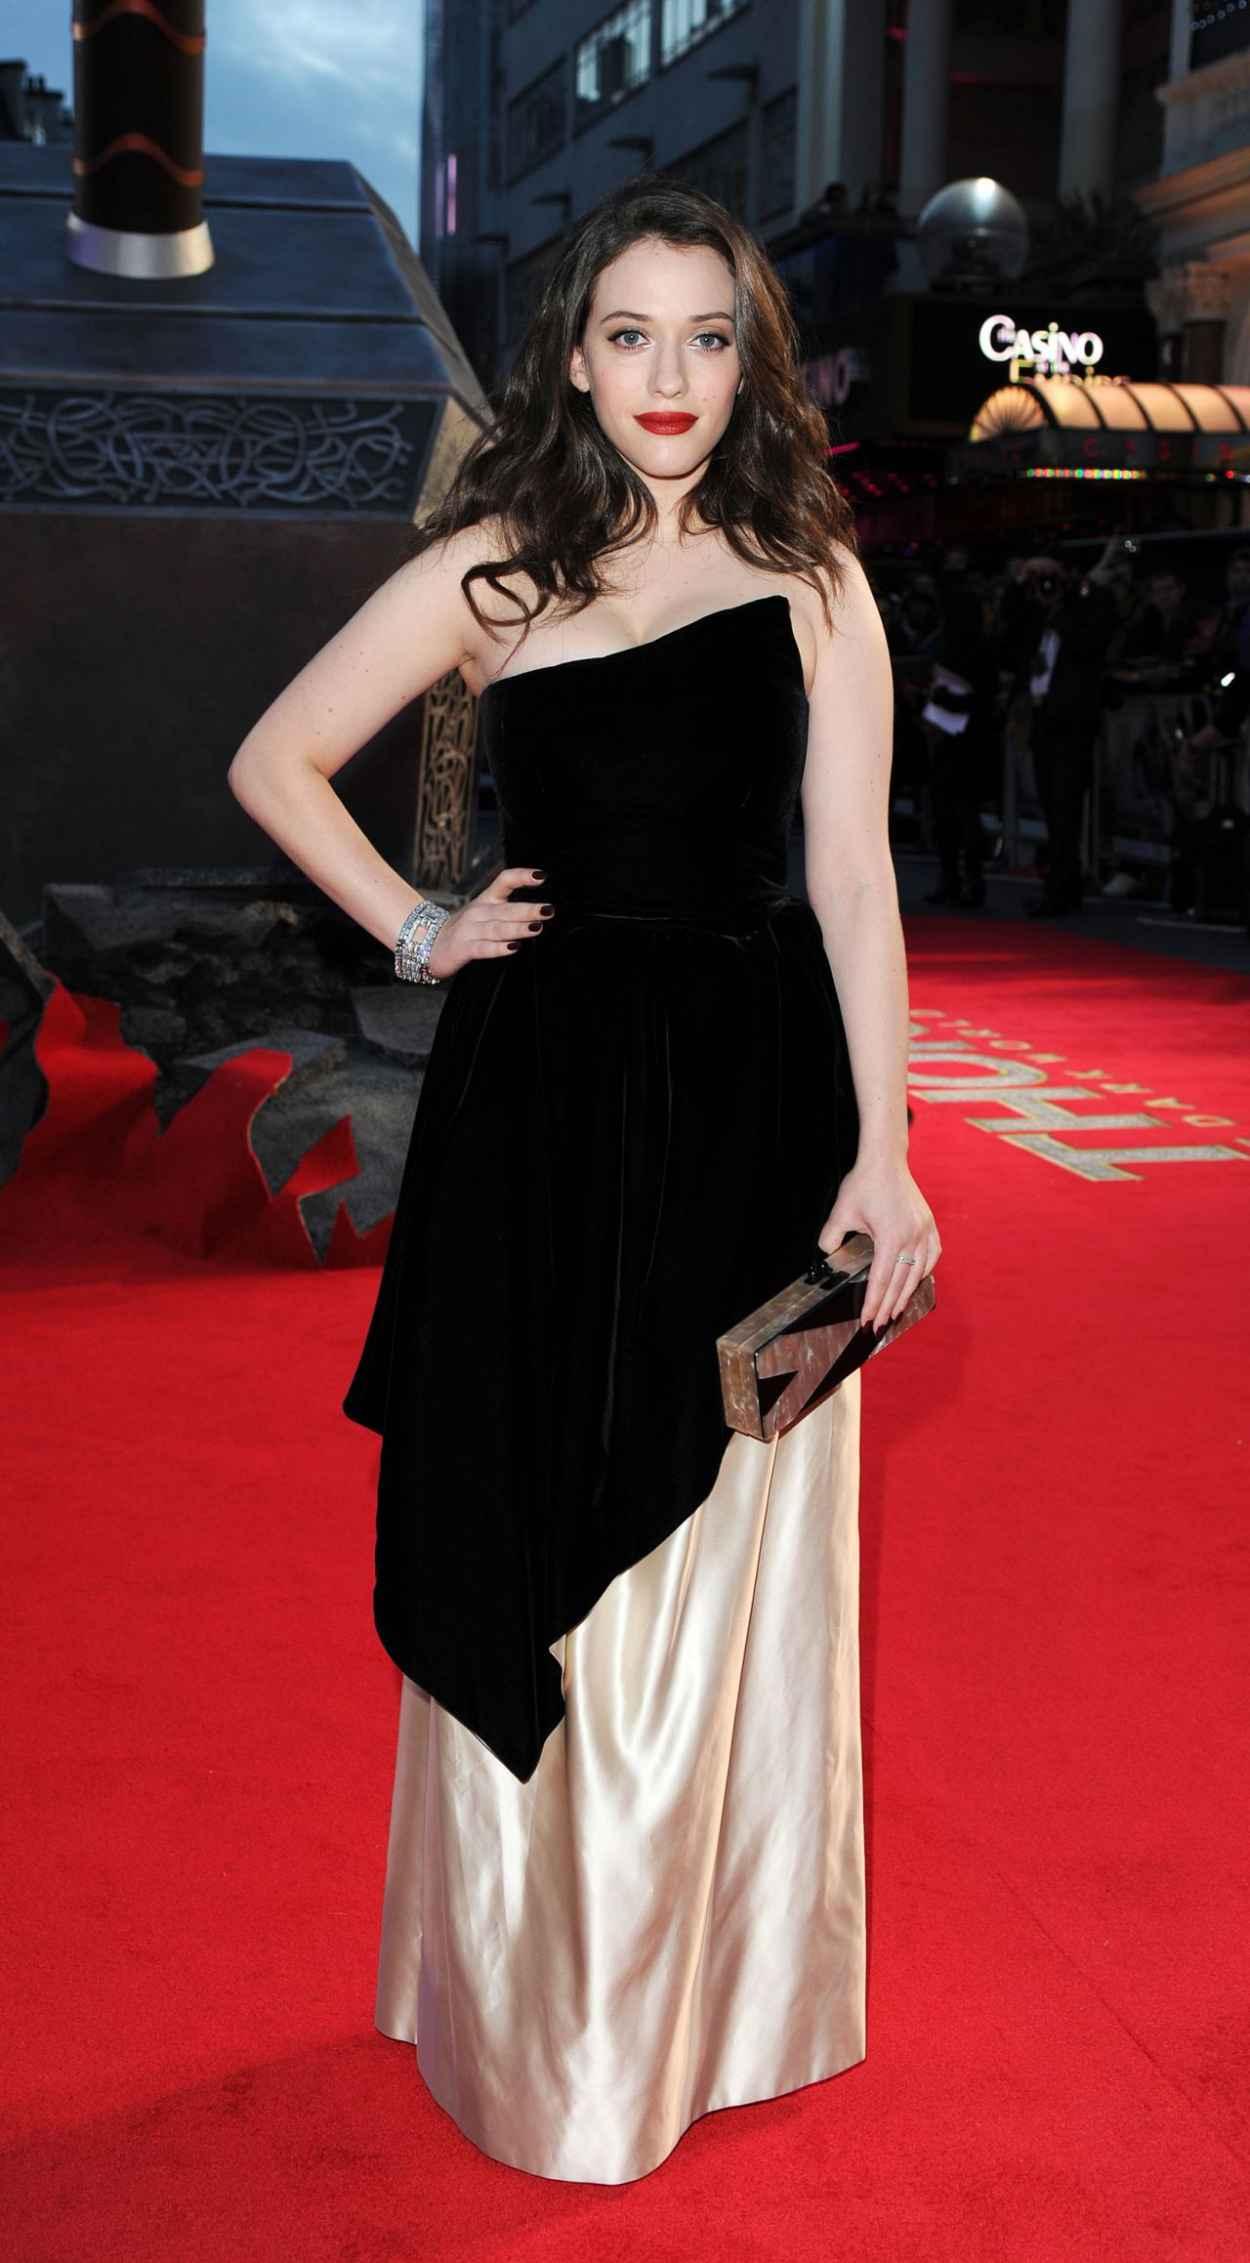 Kat Dennings - THOR: THE DARK WORLD Red Carpet in London-1